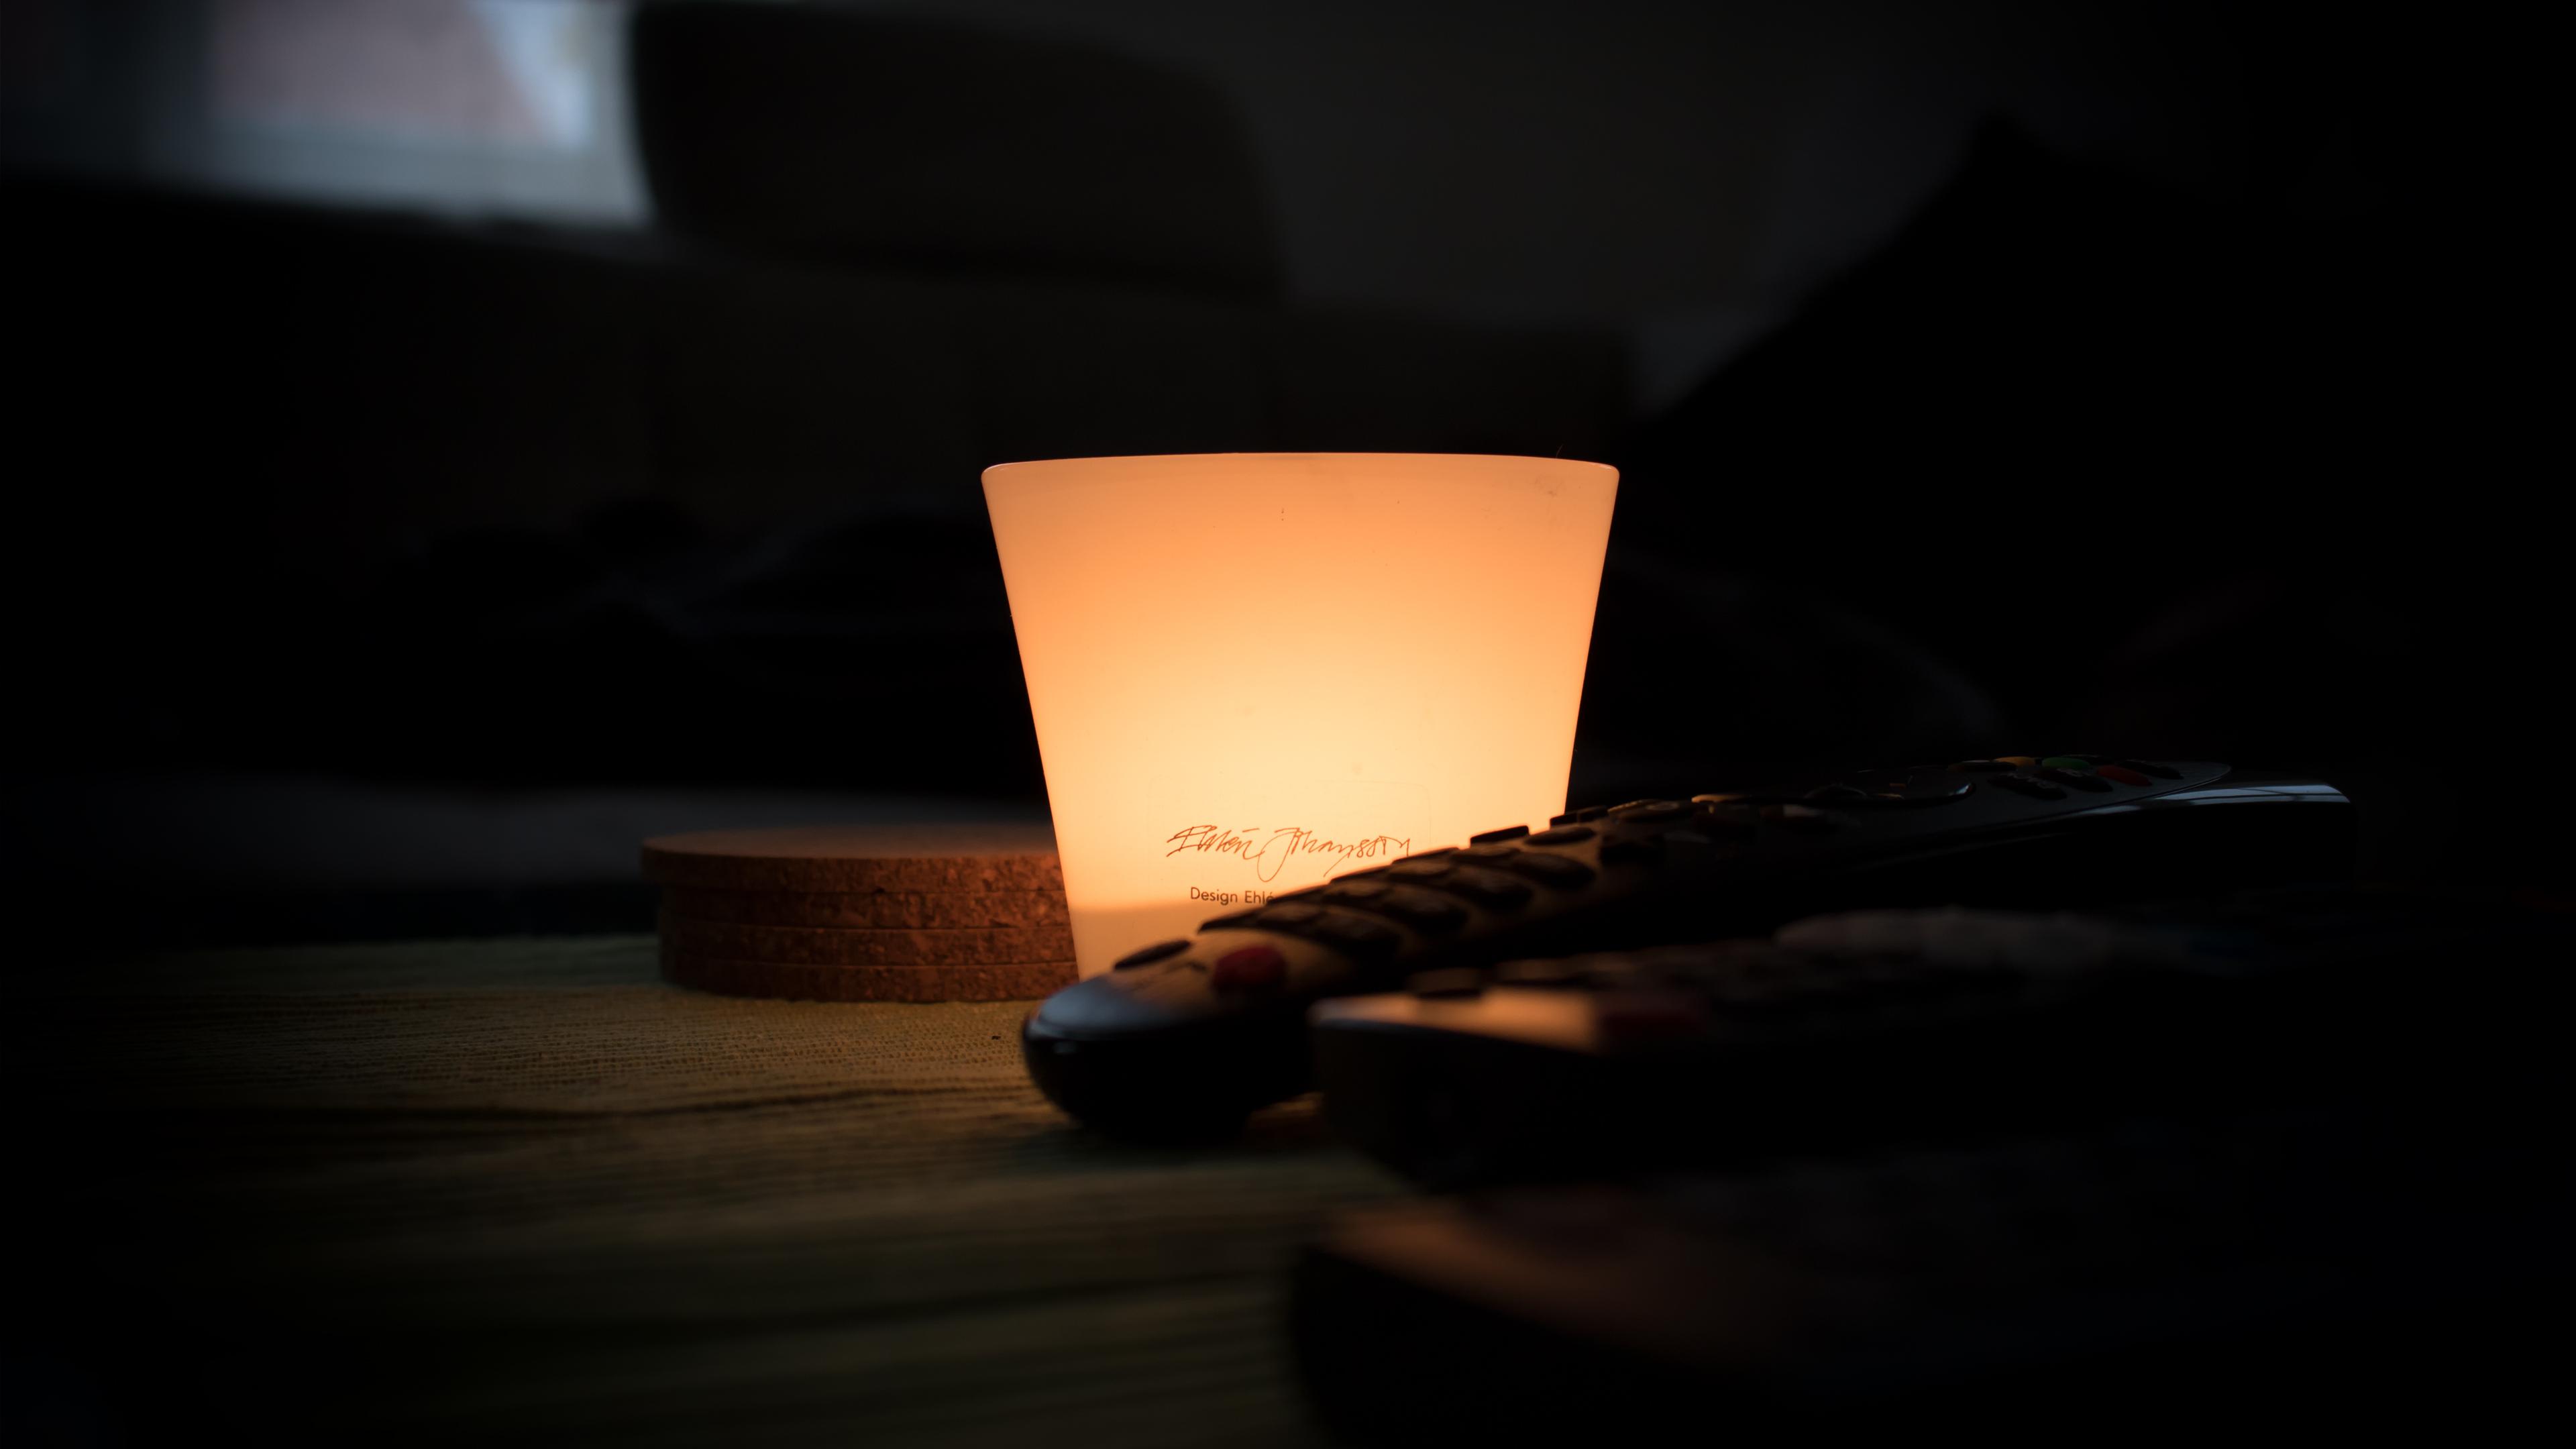 Black Remote Control Near Lamp Inside Dark Room 183 Free